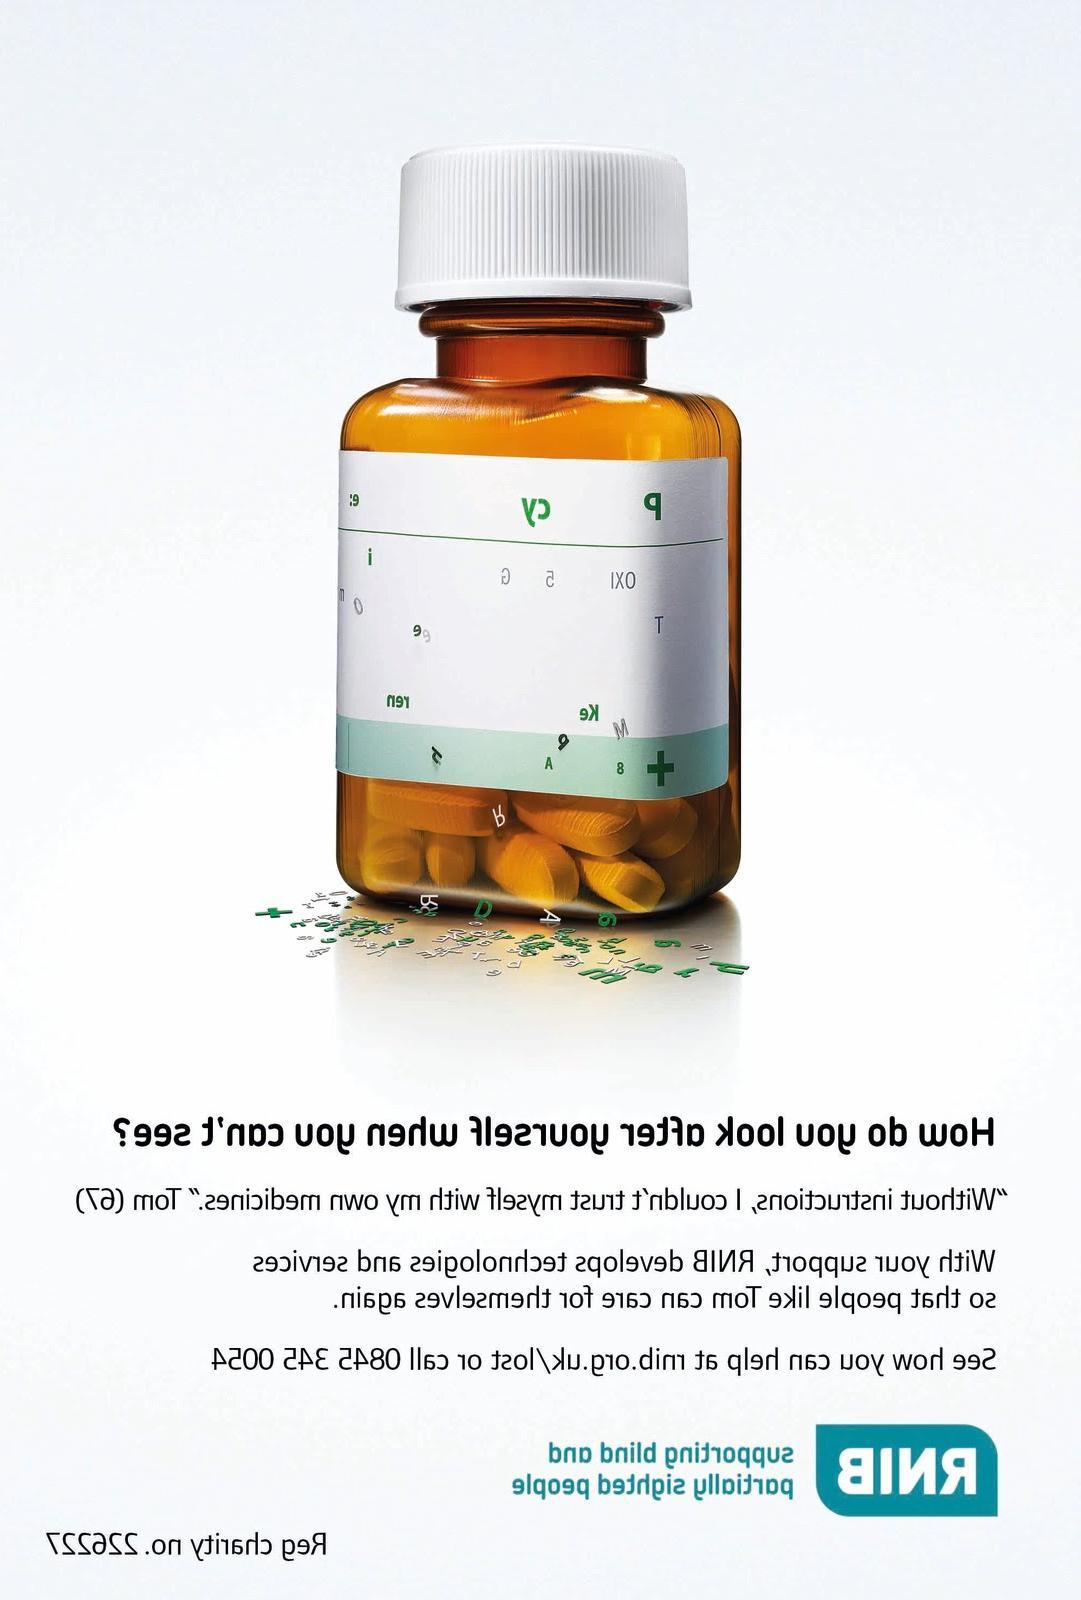 RNIB Autumn campaign launch